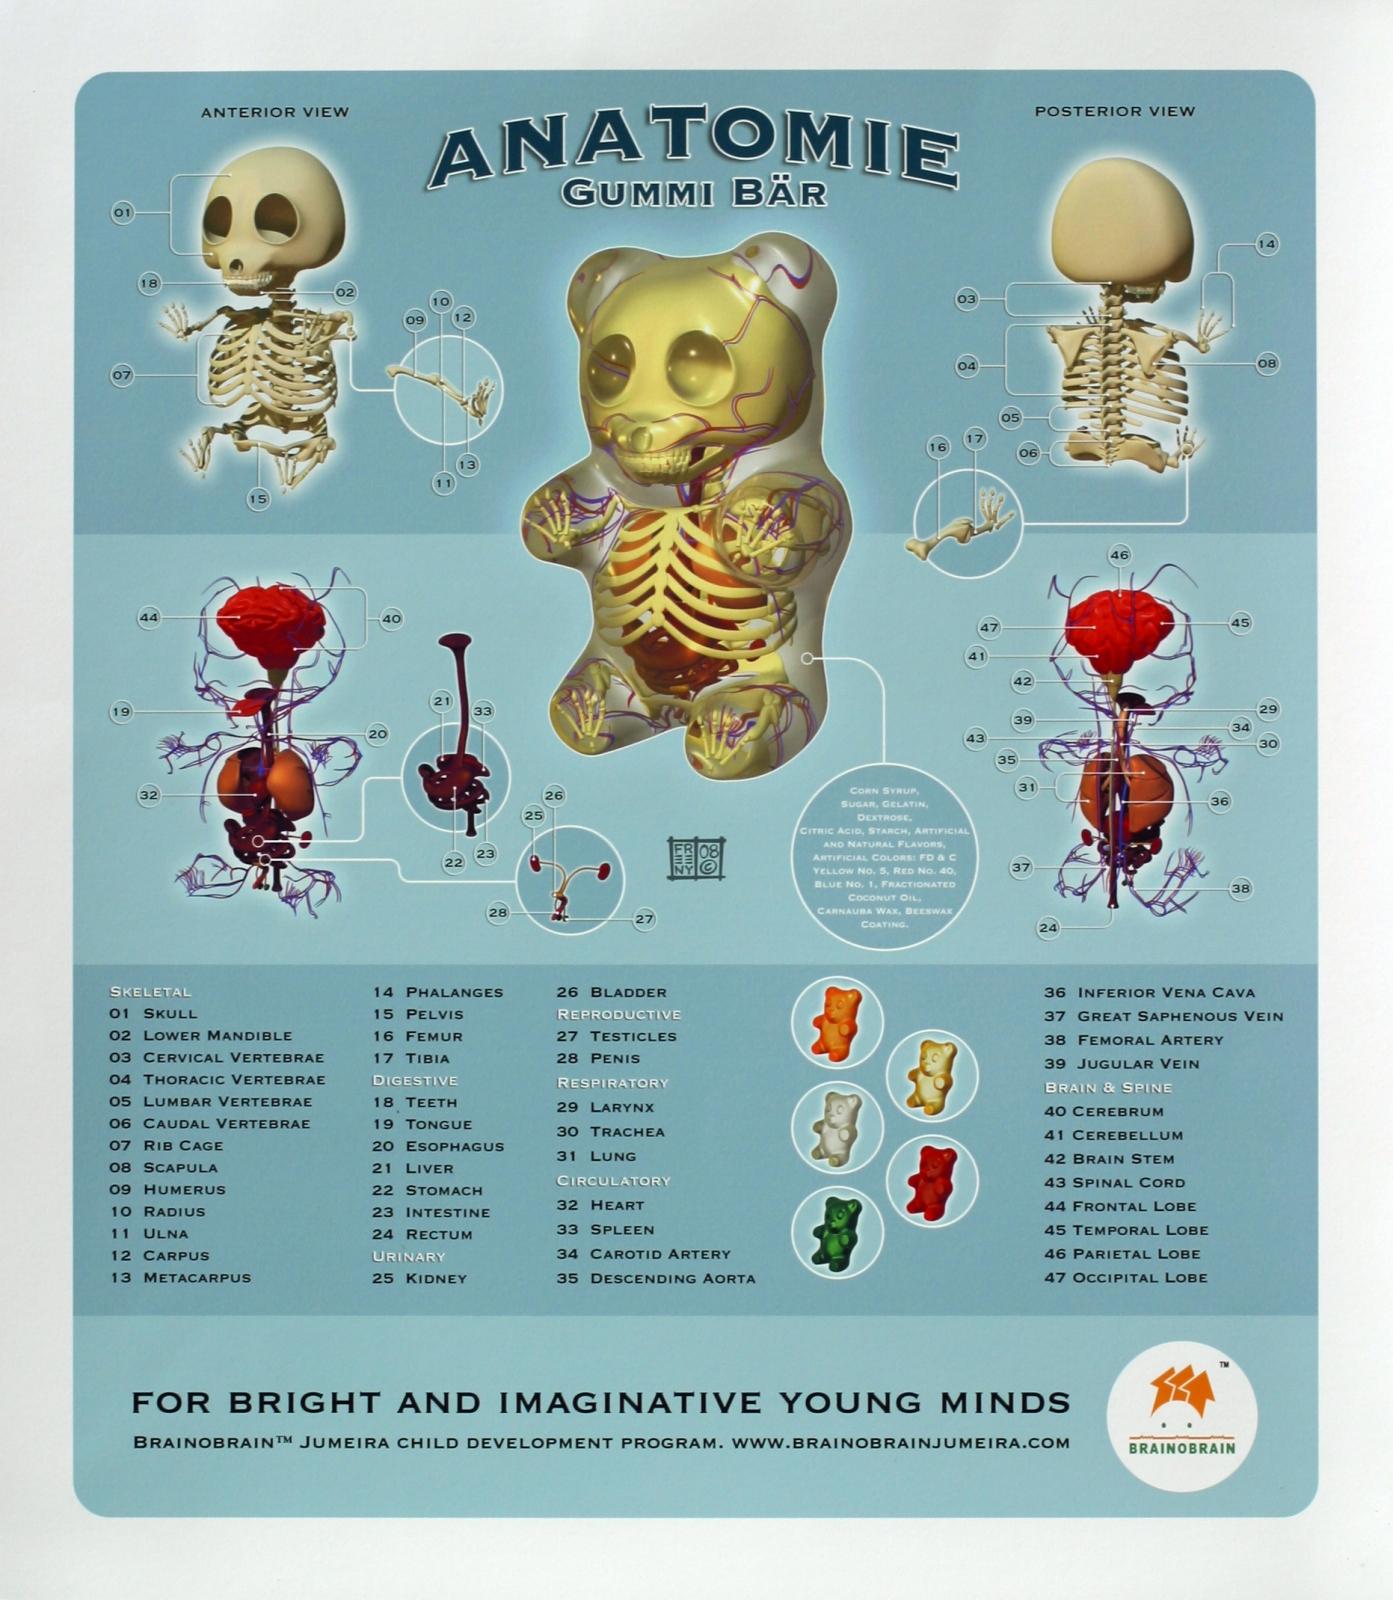 http://2.bp.blogspot.com/-mODps7VcQ0g/UJgYTAlOeGI/AAAAAAAAEL0/yh05koBfaeU/s1600/gummy_bear_anatomy_jason_freeny.jpg